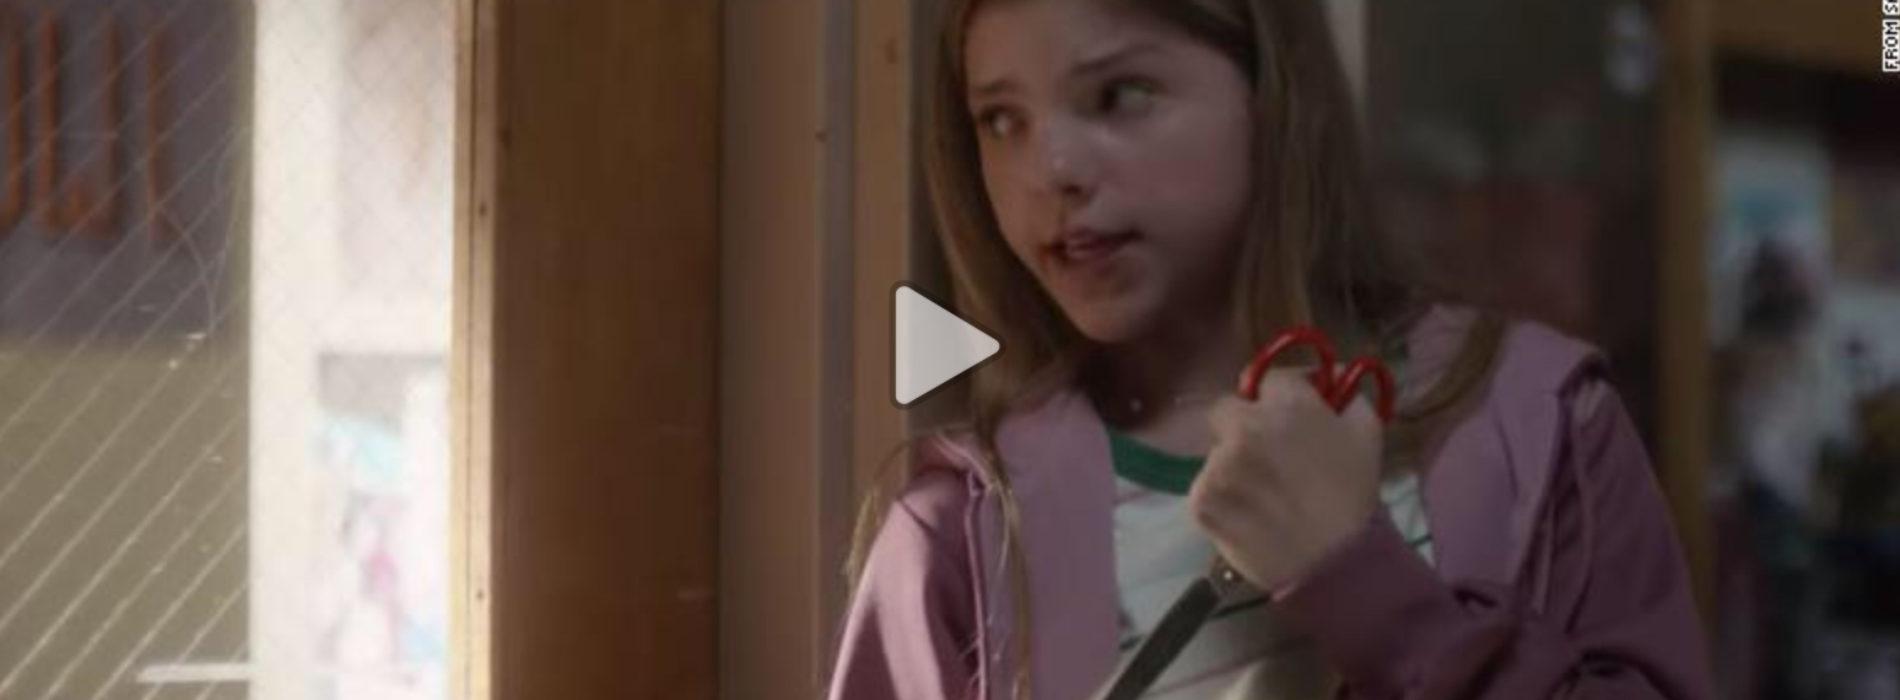 Sandy Hook parents release chilling 'back to school' PSA